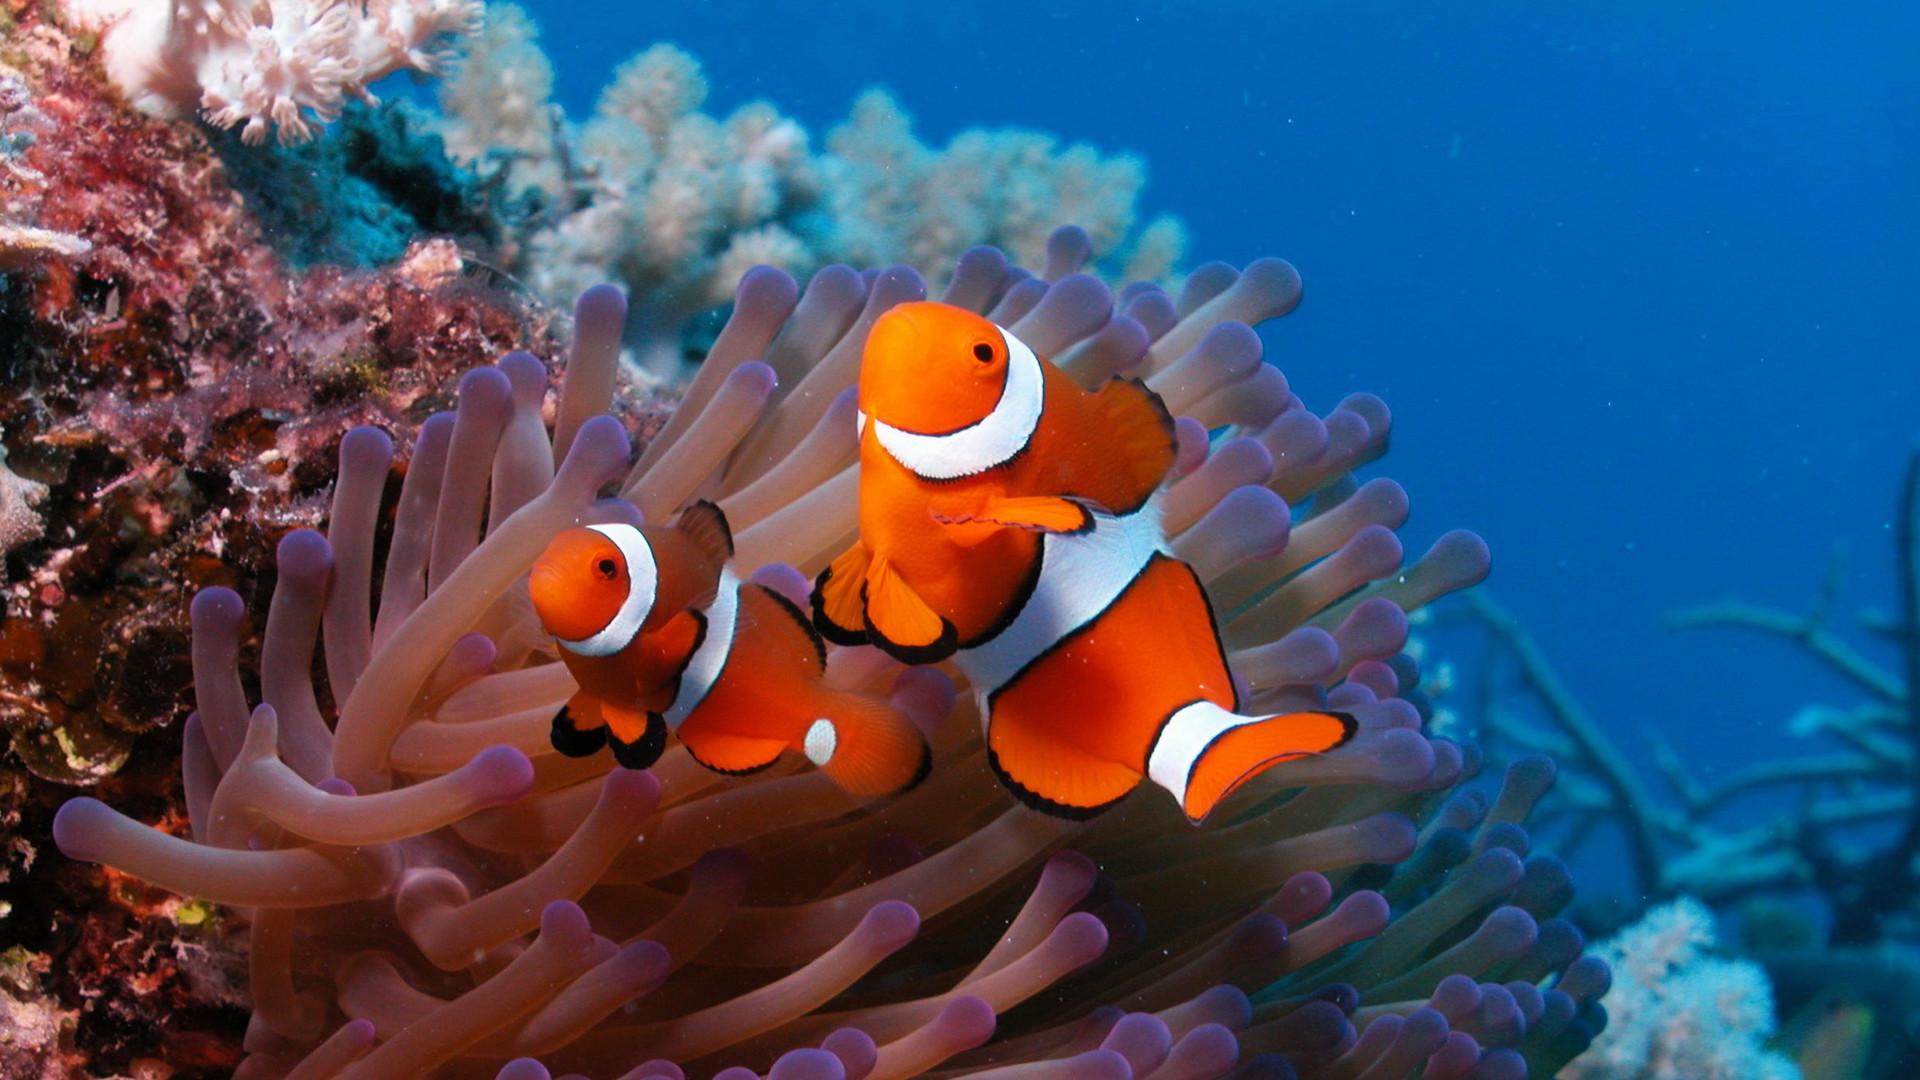 Underwater World HD Wallpapers 1600×1200 Wallpapers Underwater (36  Wallpapers) | Adorable Wallpapers